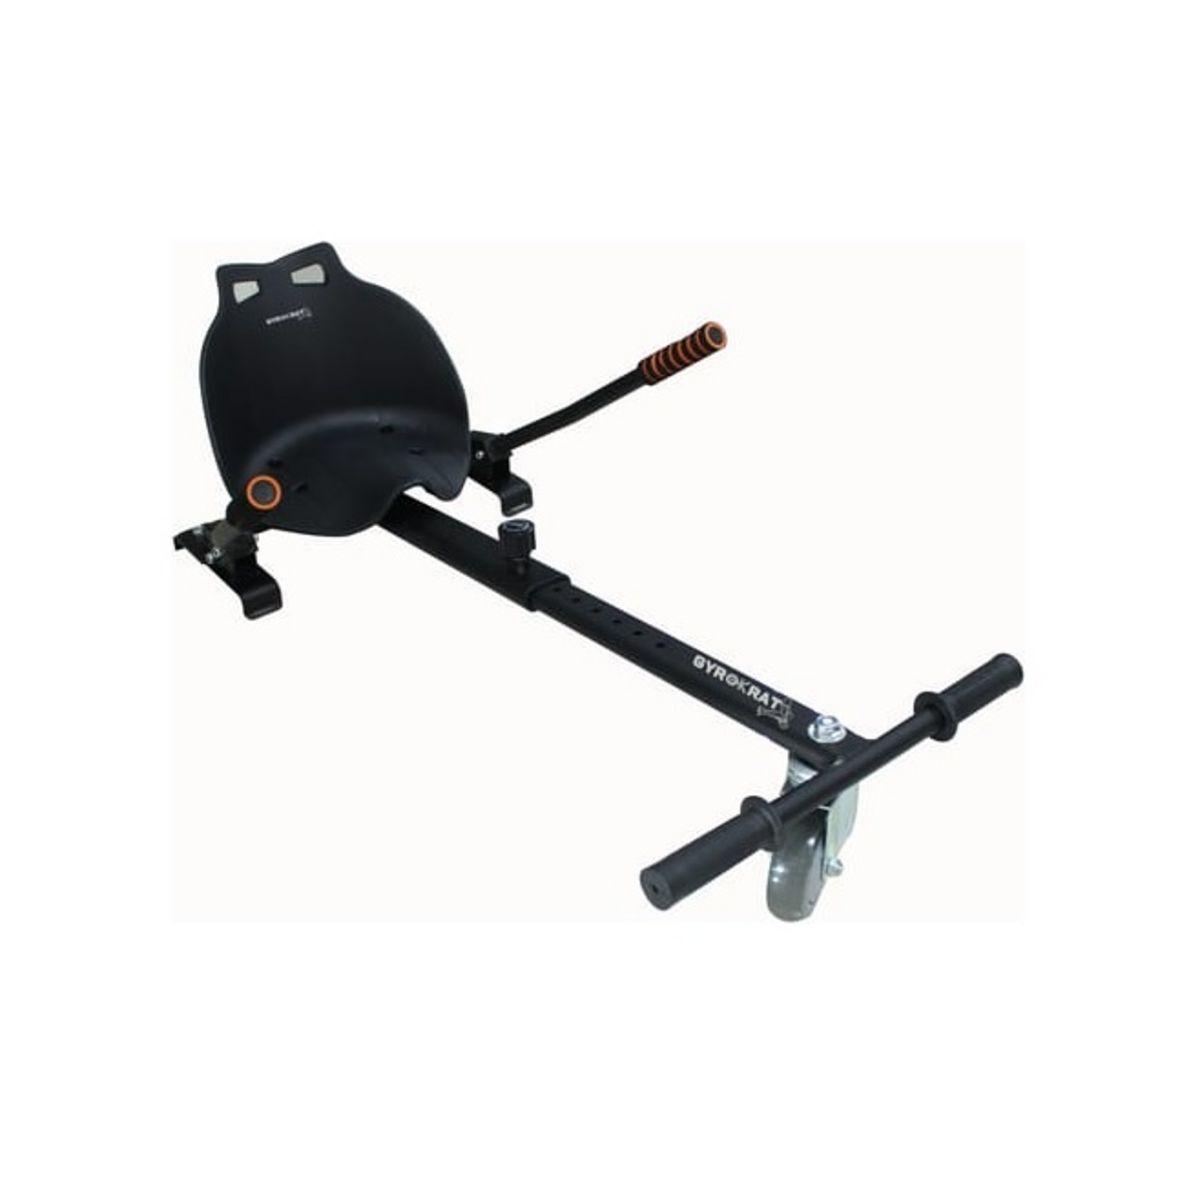 Kart pour hoverboard avec siège - Noir